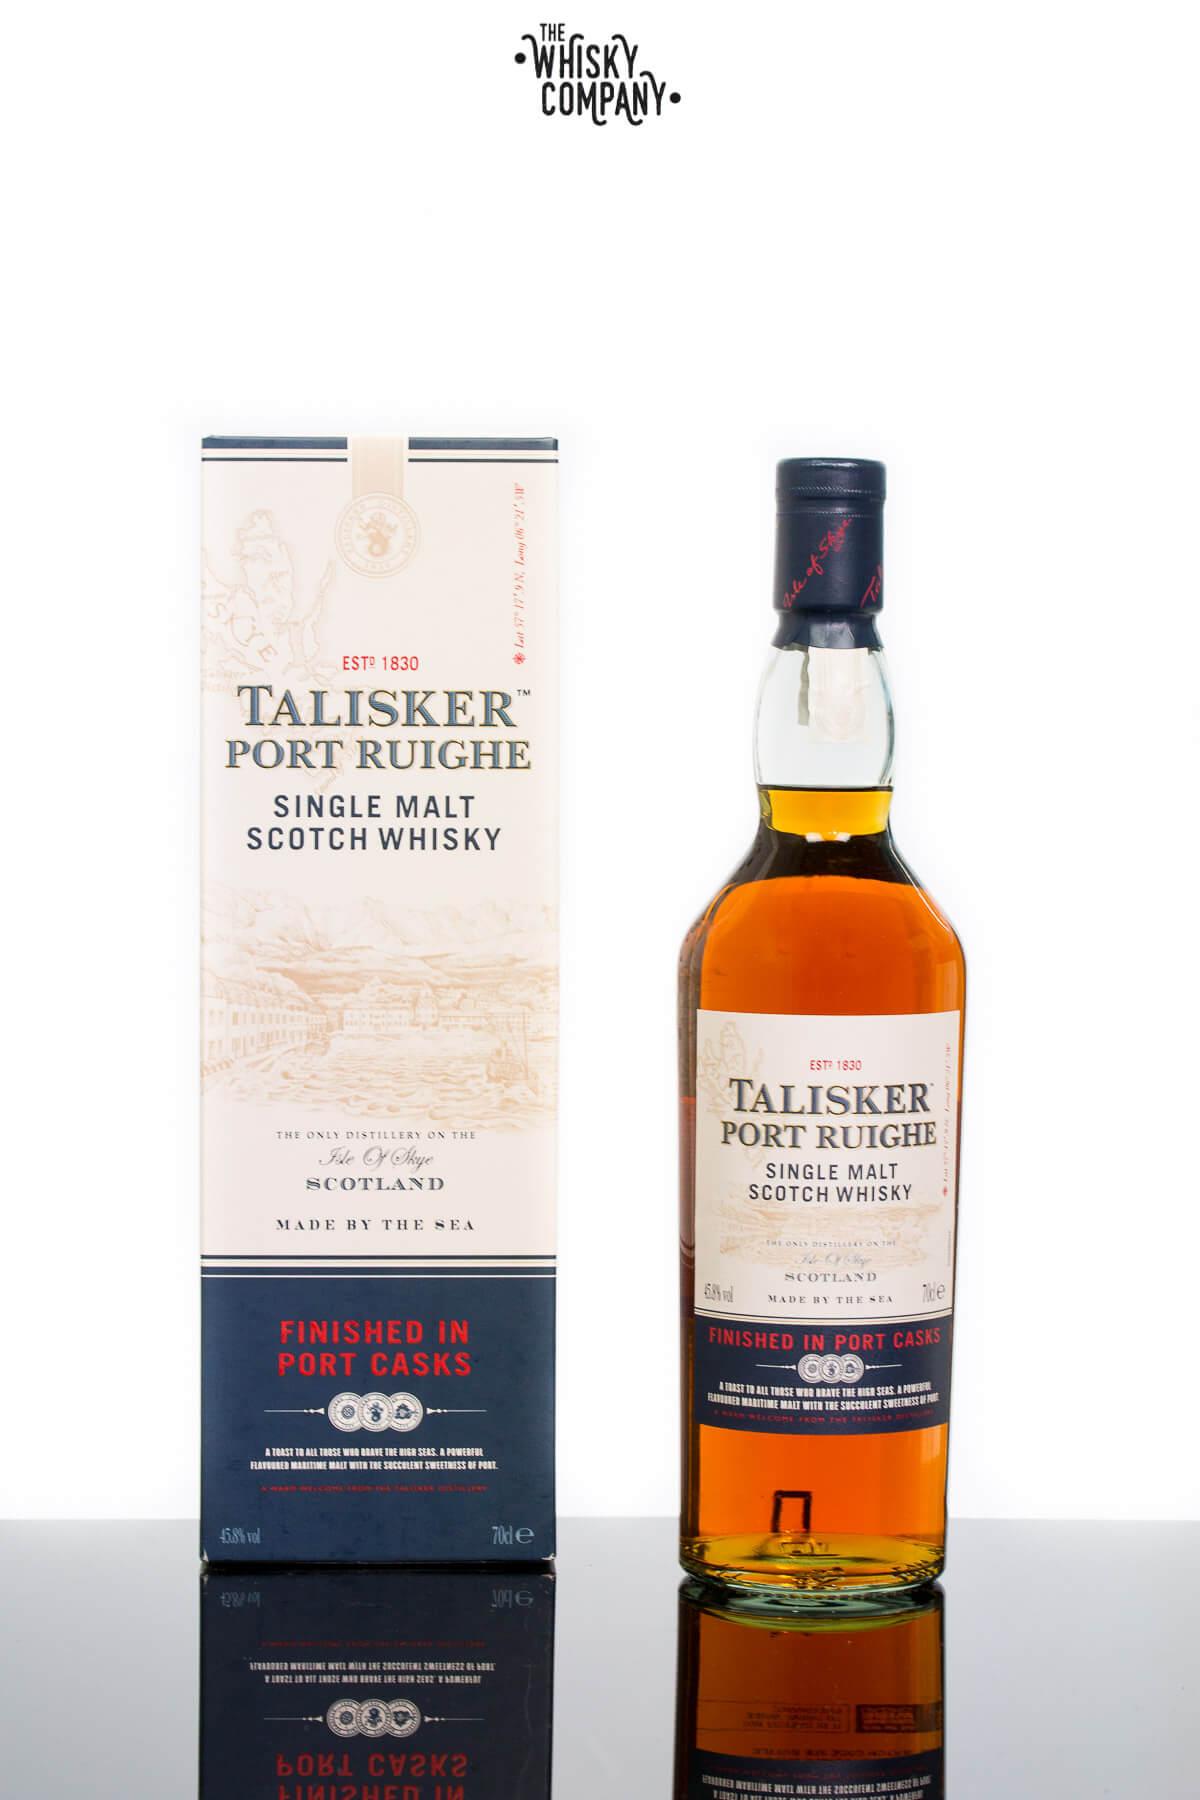 Talisker Port Ruighe Island Single Malt Scotch Whisky